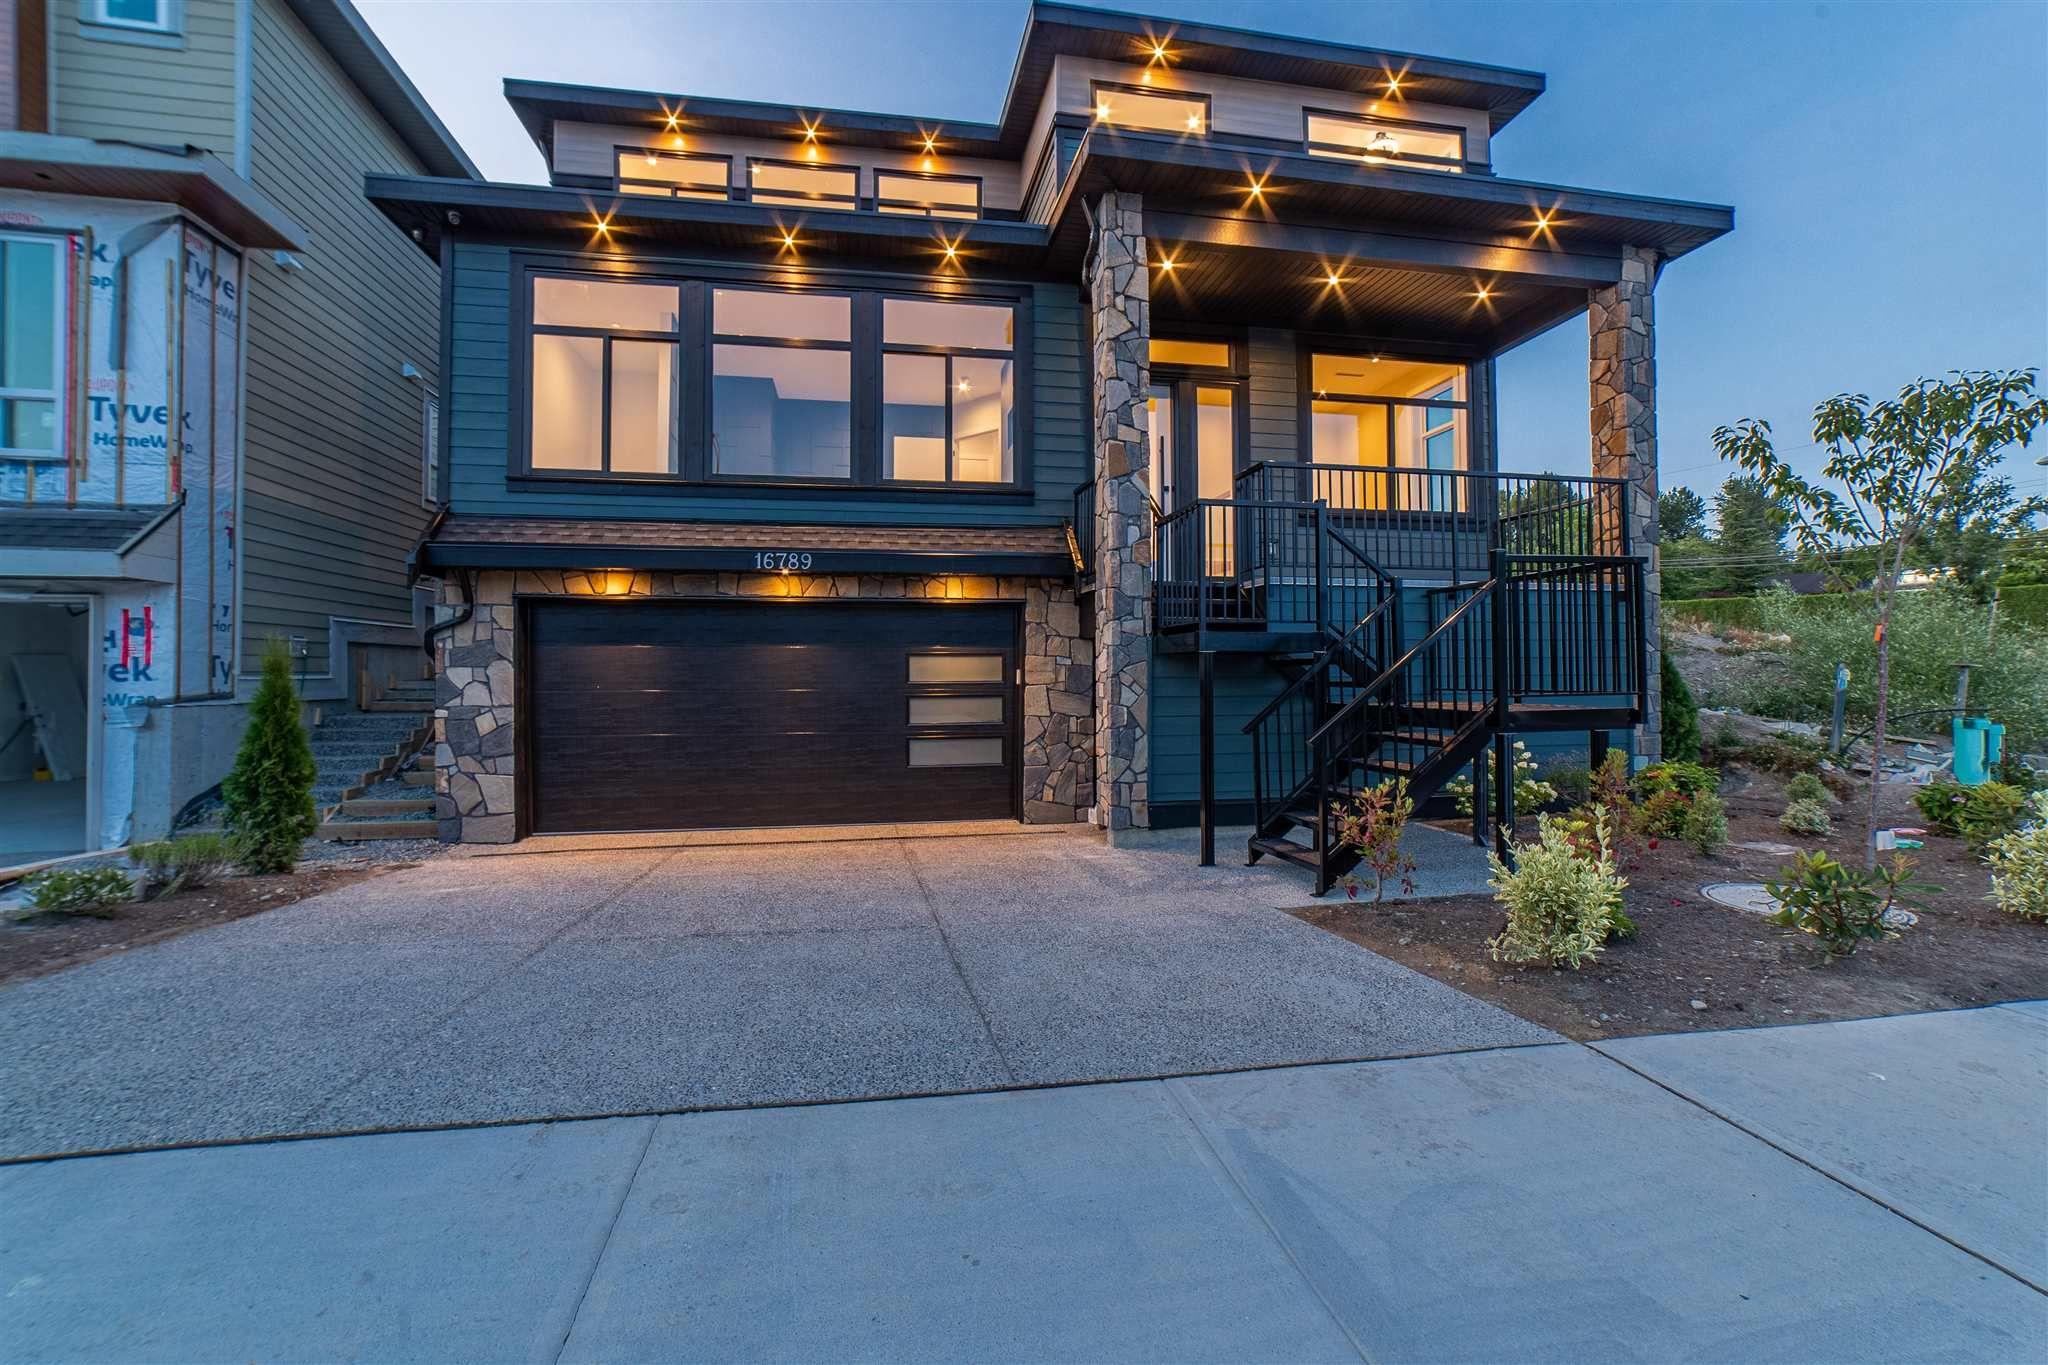 Main Photo: 16789 18A Avenue in Surrey: Pacific Douglas House for sale (South Surrey White Rock)  : MLS®# R2617287